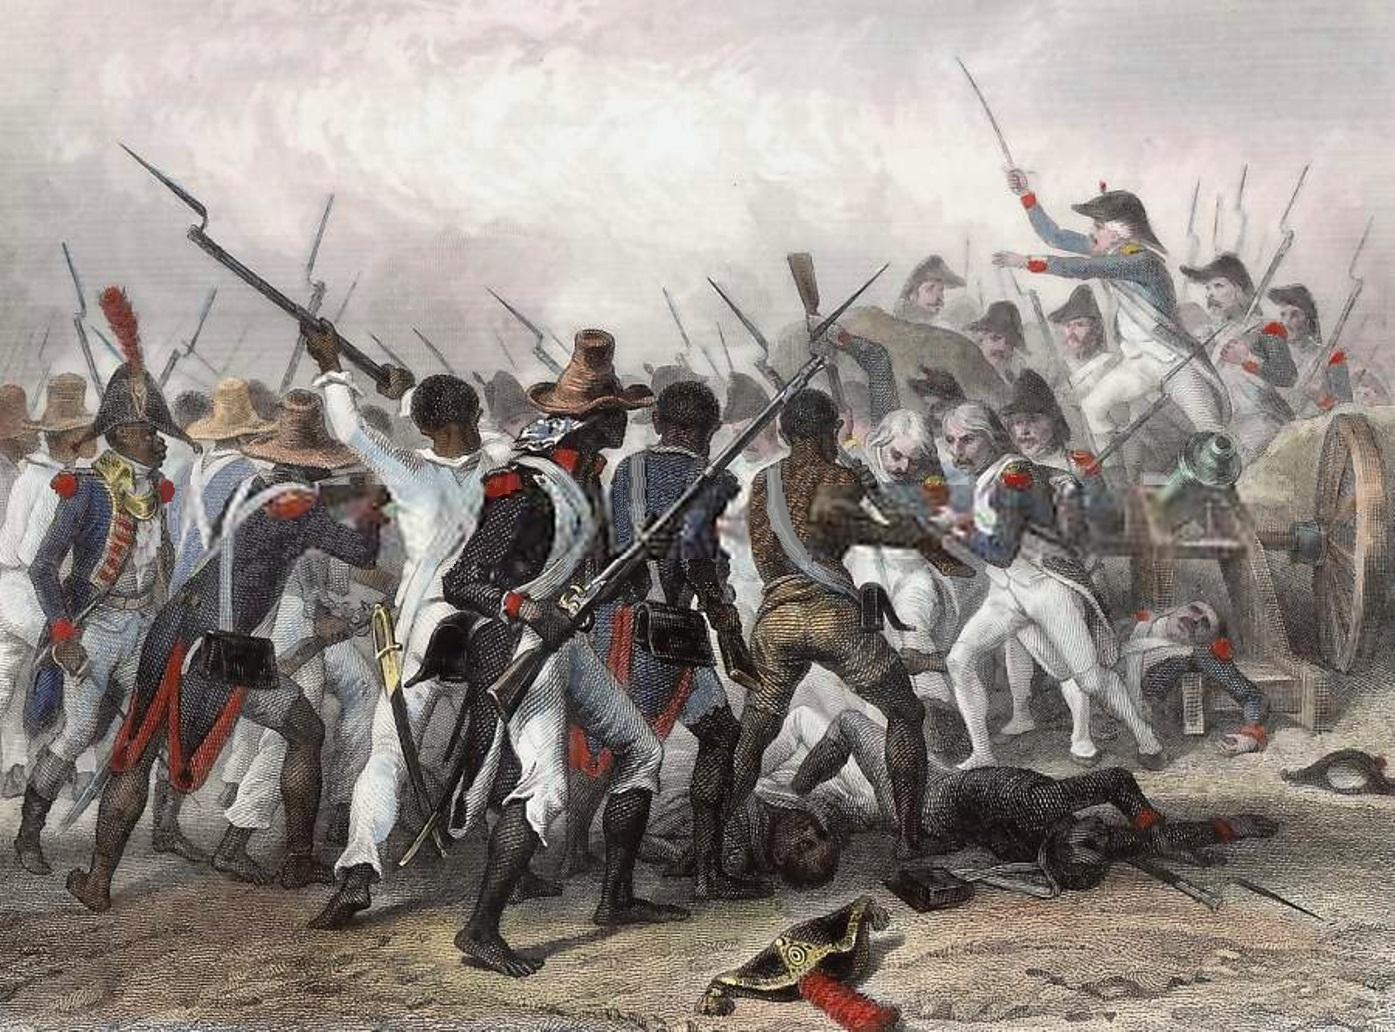 http://www.latinamericanstudies.org/haiti/Battle-Vertieres-1803.jpg